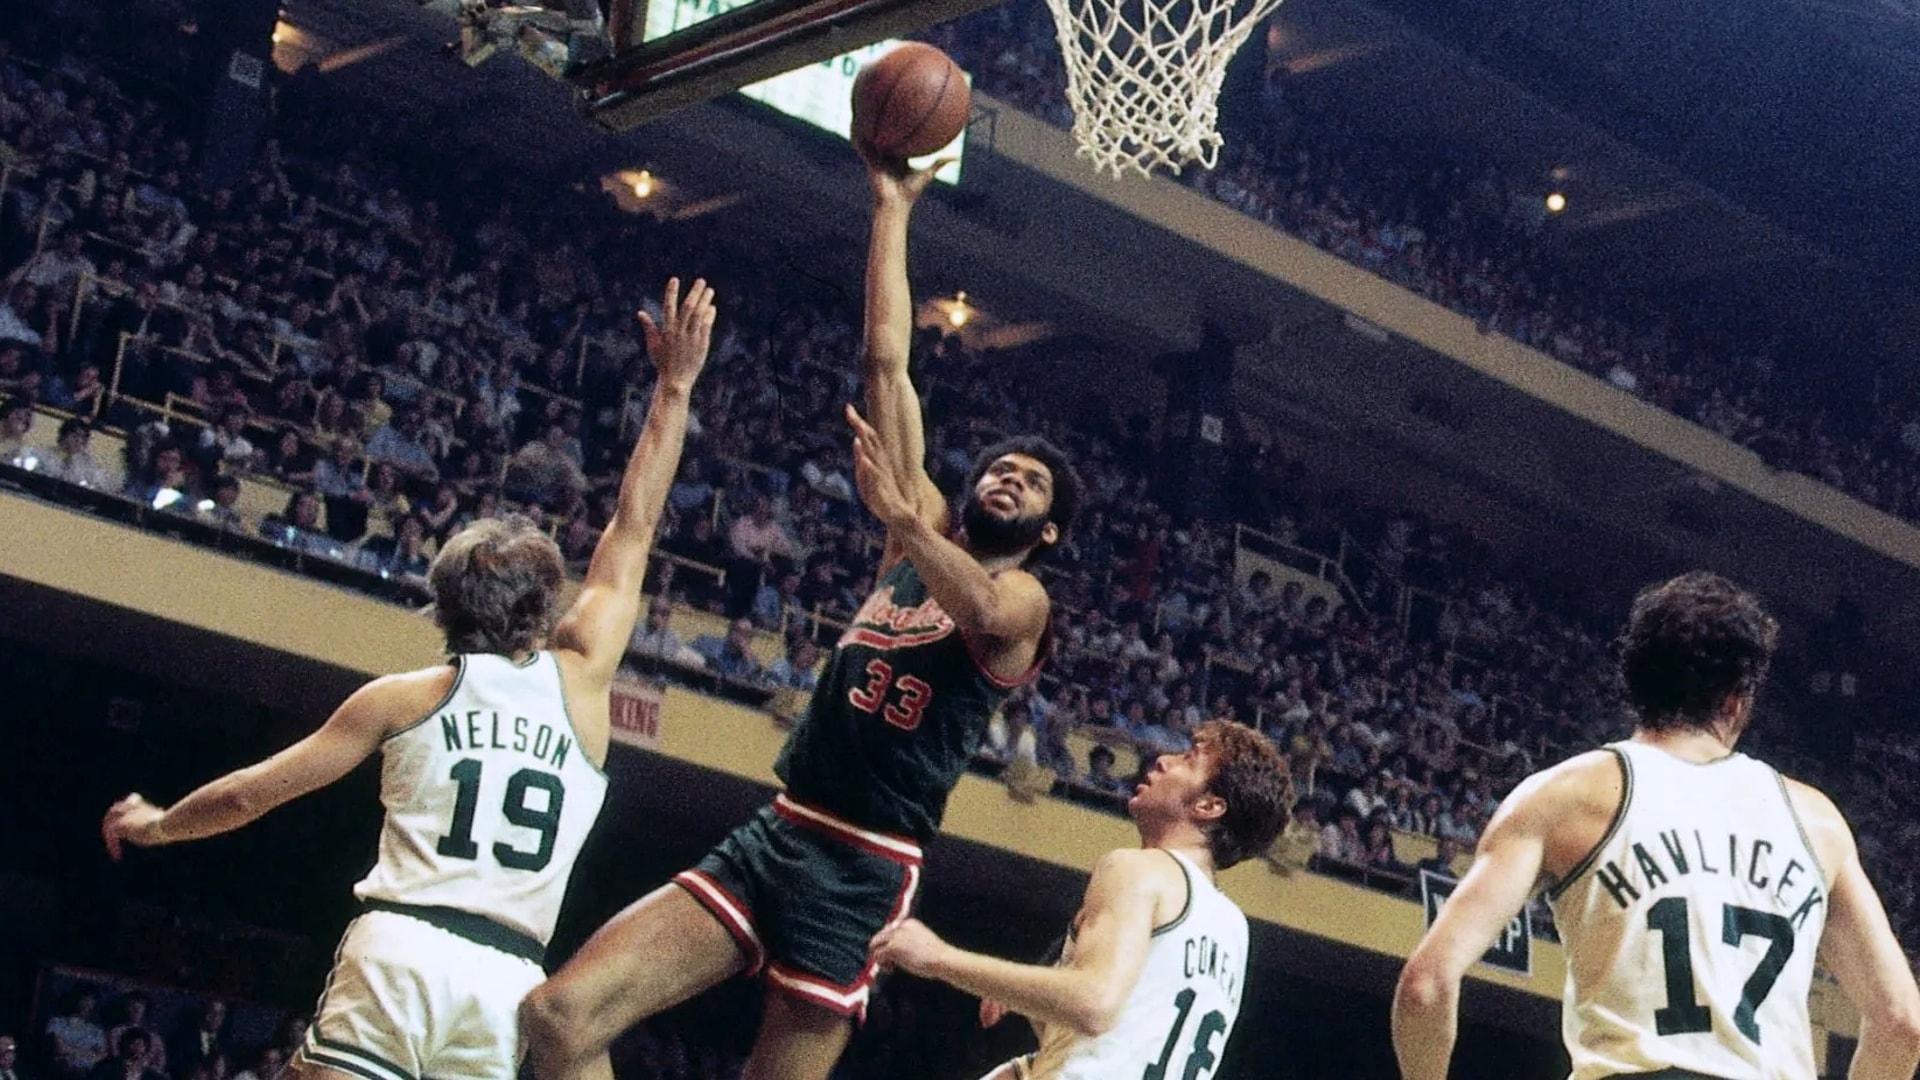 Top Moments: Kareem Abdul-Jabbar's skyhook wins double OT thriller in 1974 NBA Finals